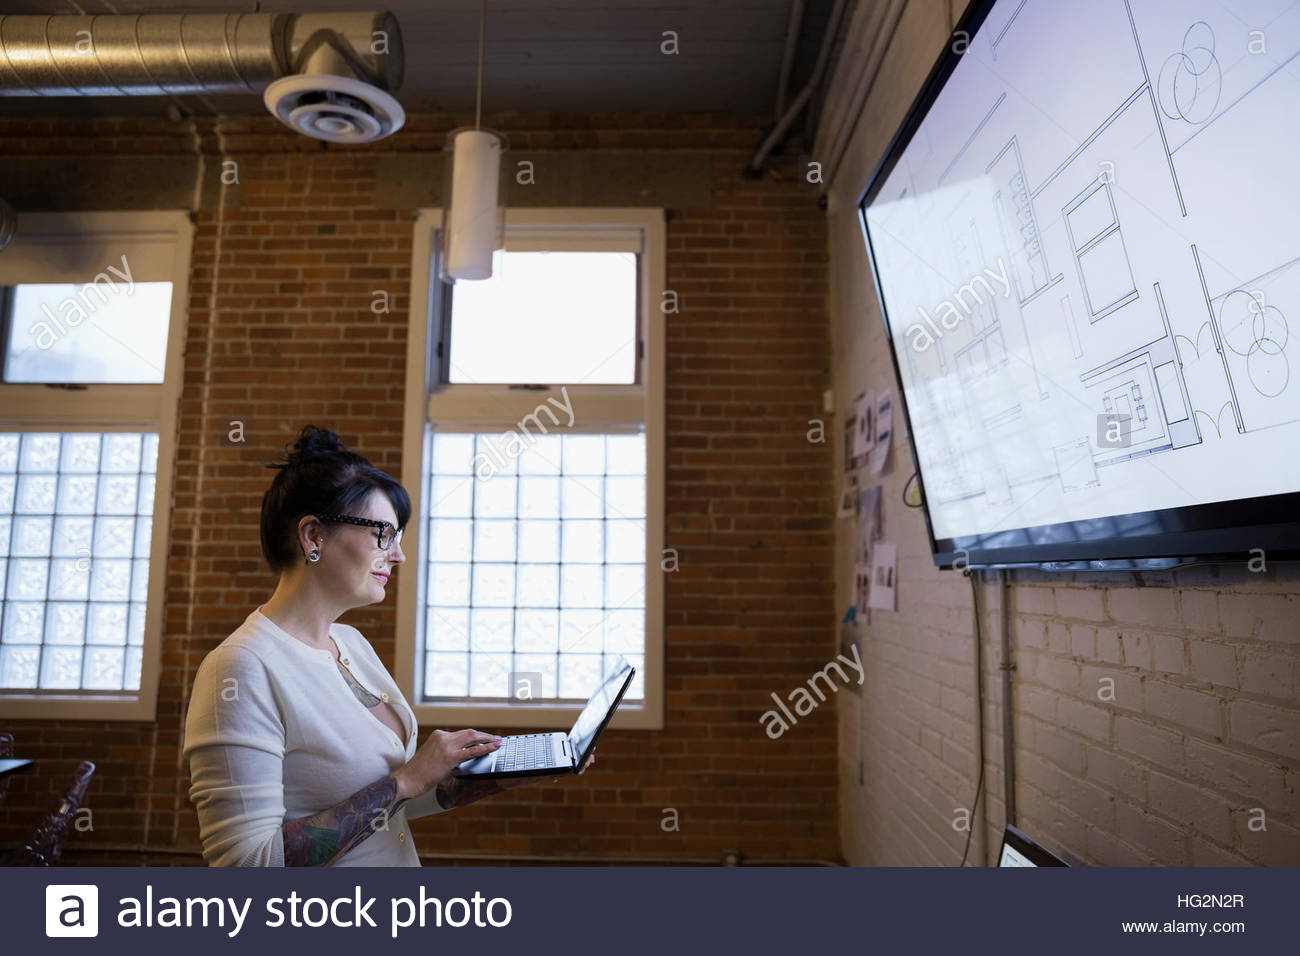 Female architect drafting digital blueprints on laptop at television monitor - Stock Image